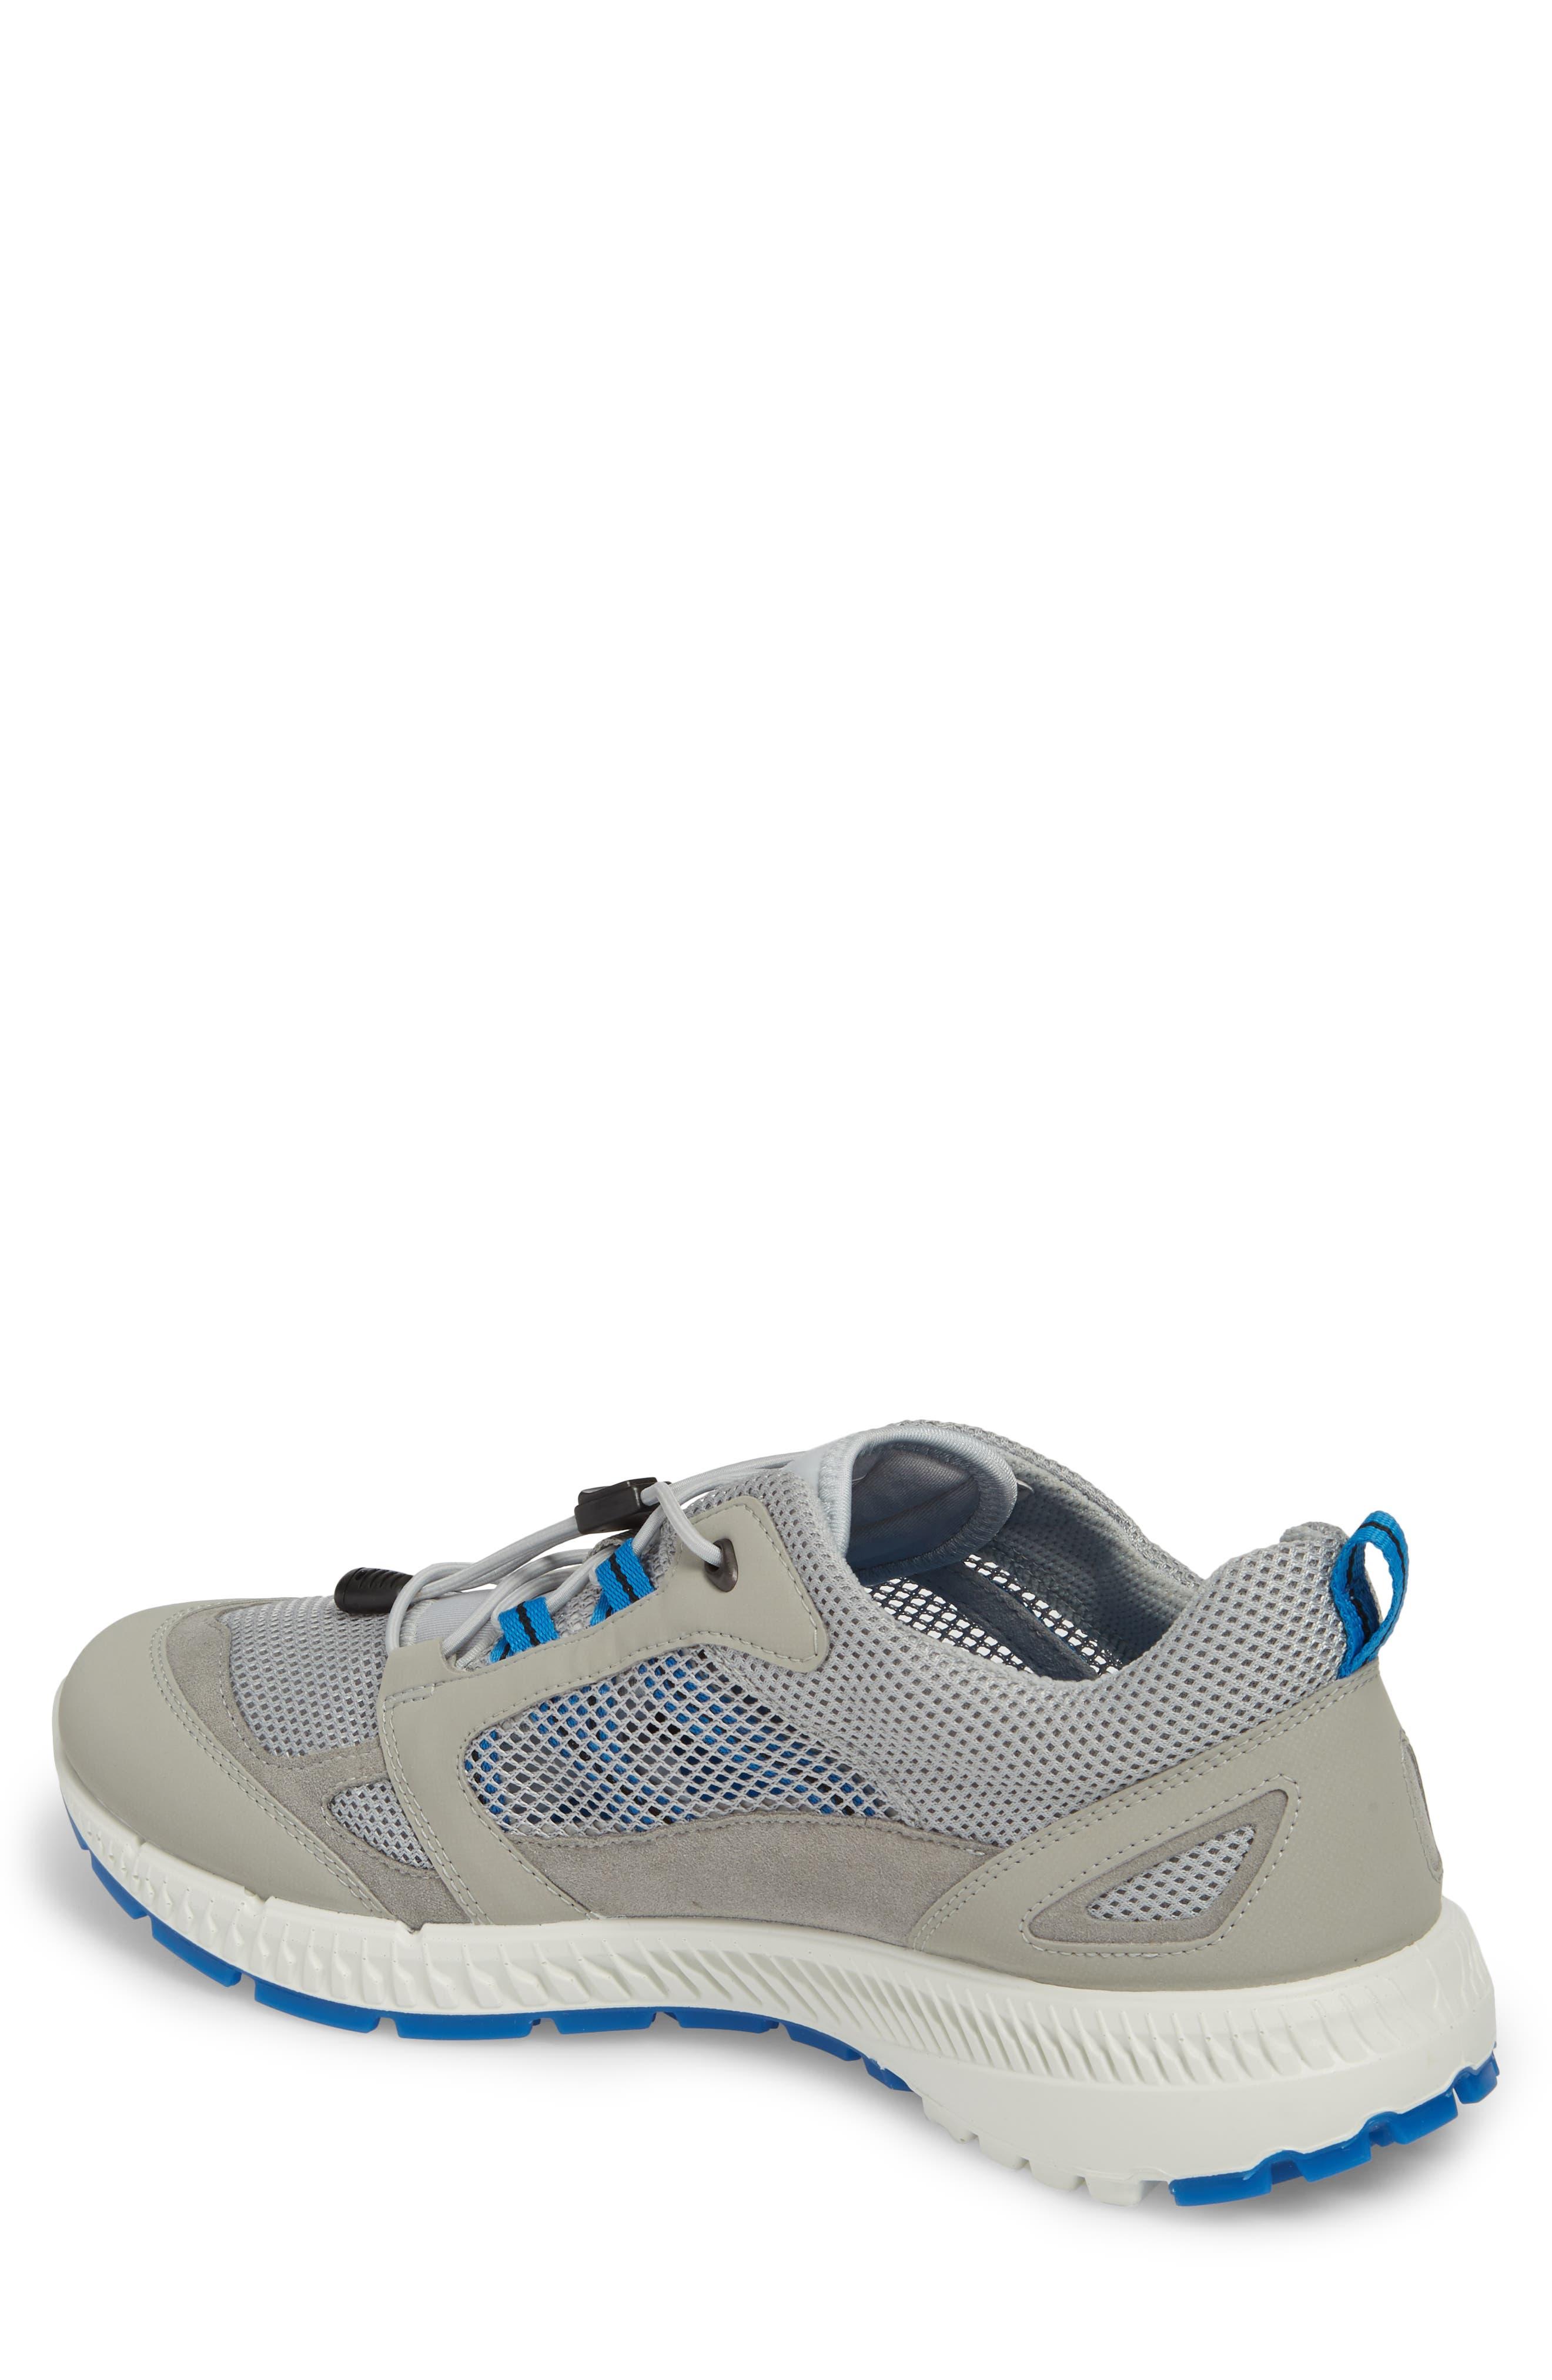 Terracruise II Sneaker,                             Alternate thumbnail 2, color,                             Wild Dove Leather